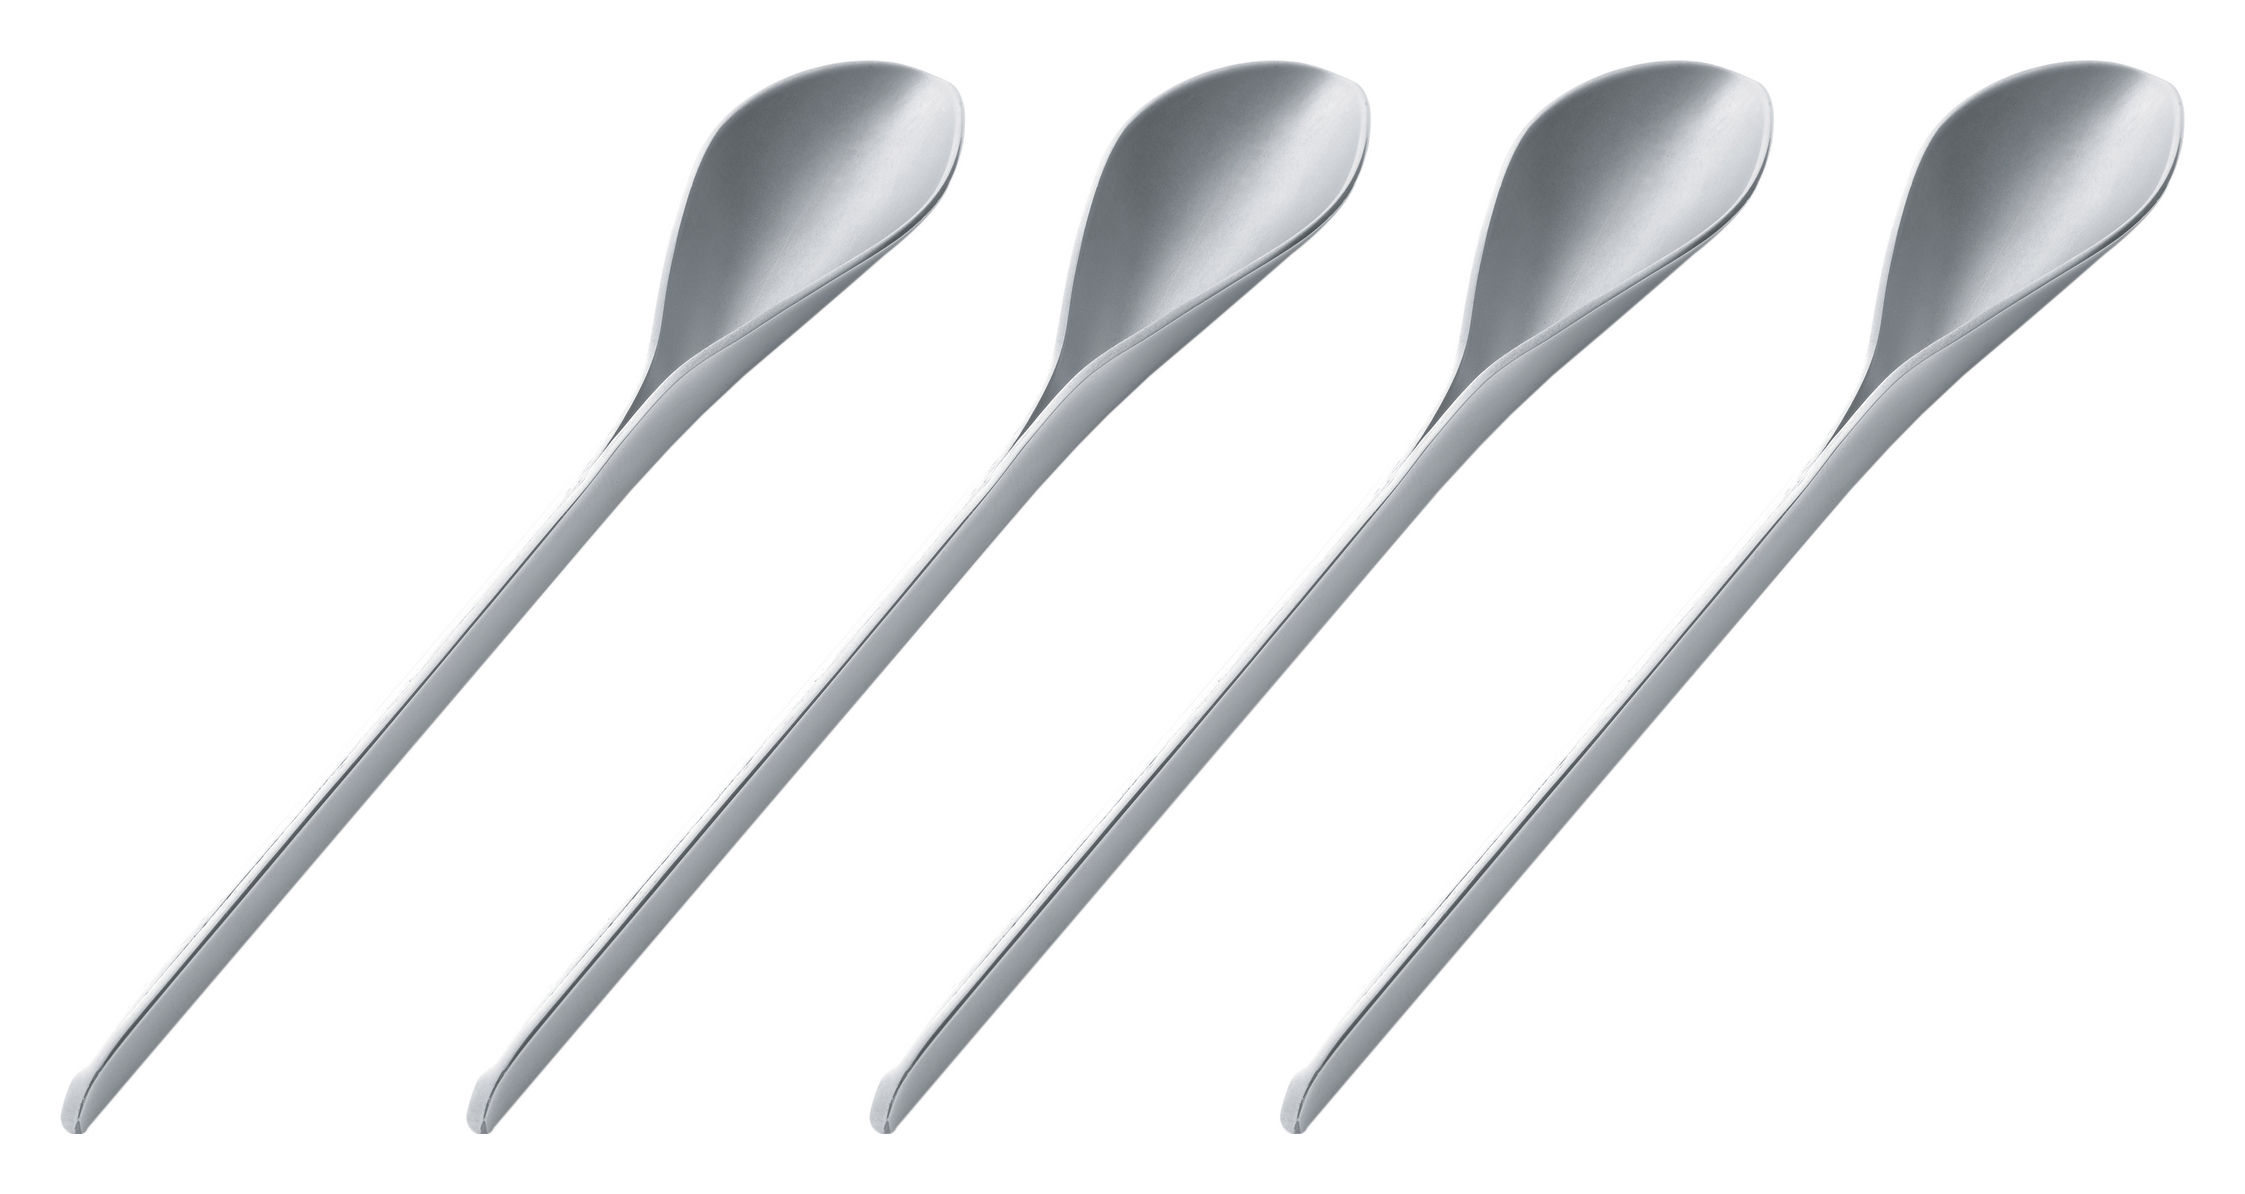 Tischkultur - Bestecke - E-Li-Li Kaffeelöffel 4 Stück - Alessi - Stahl - rostfreier Stahl